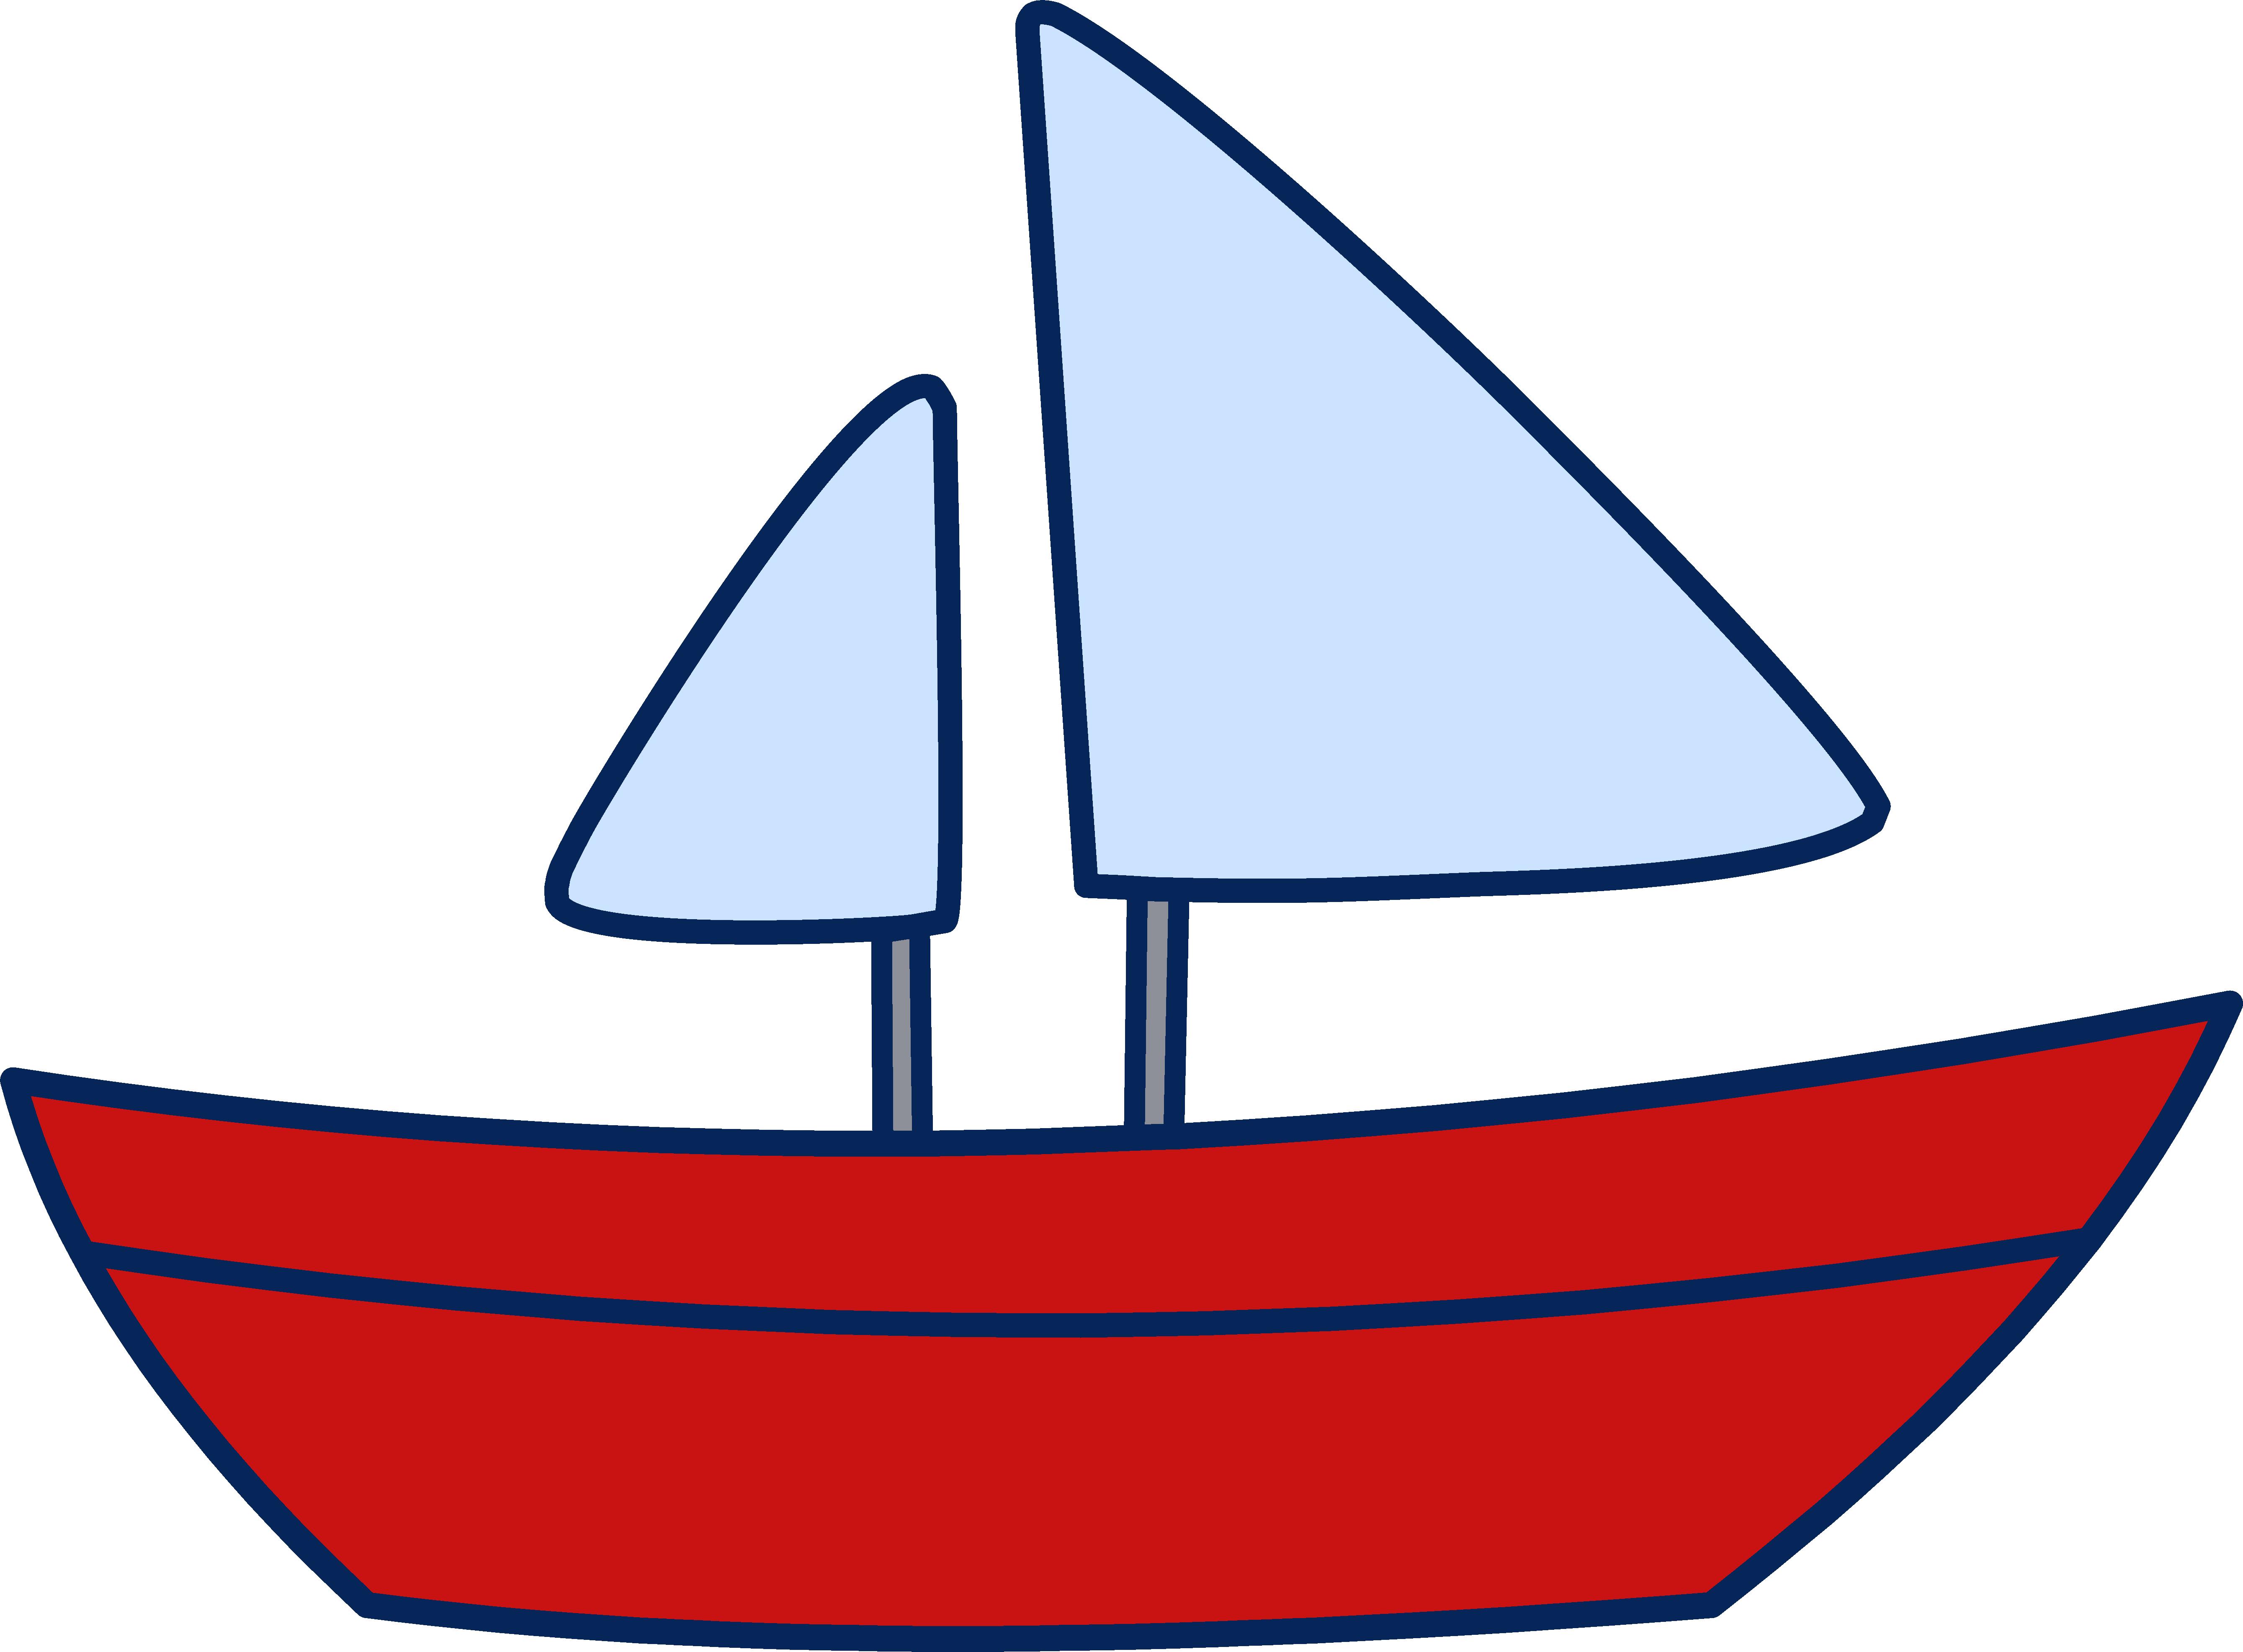 5357x3945 Sailboat Clipart For Baby Boy Clipart Panda